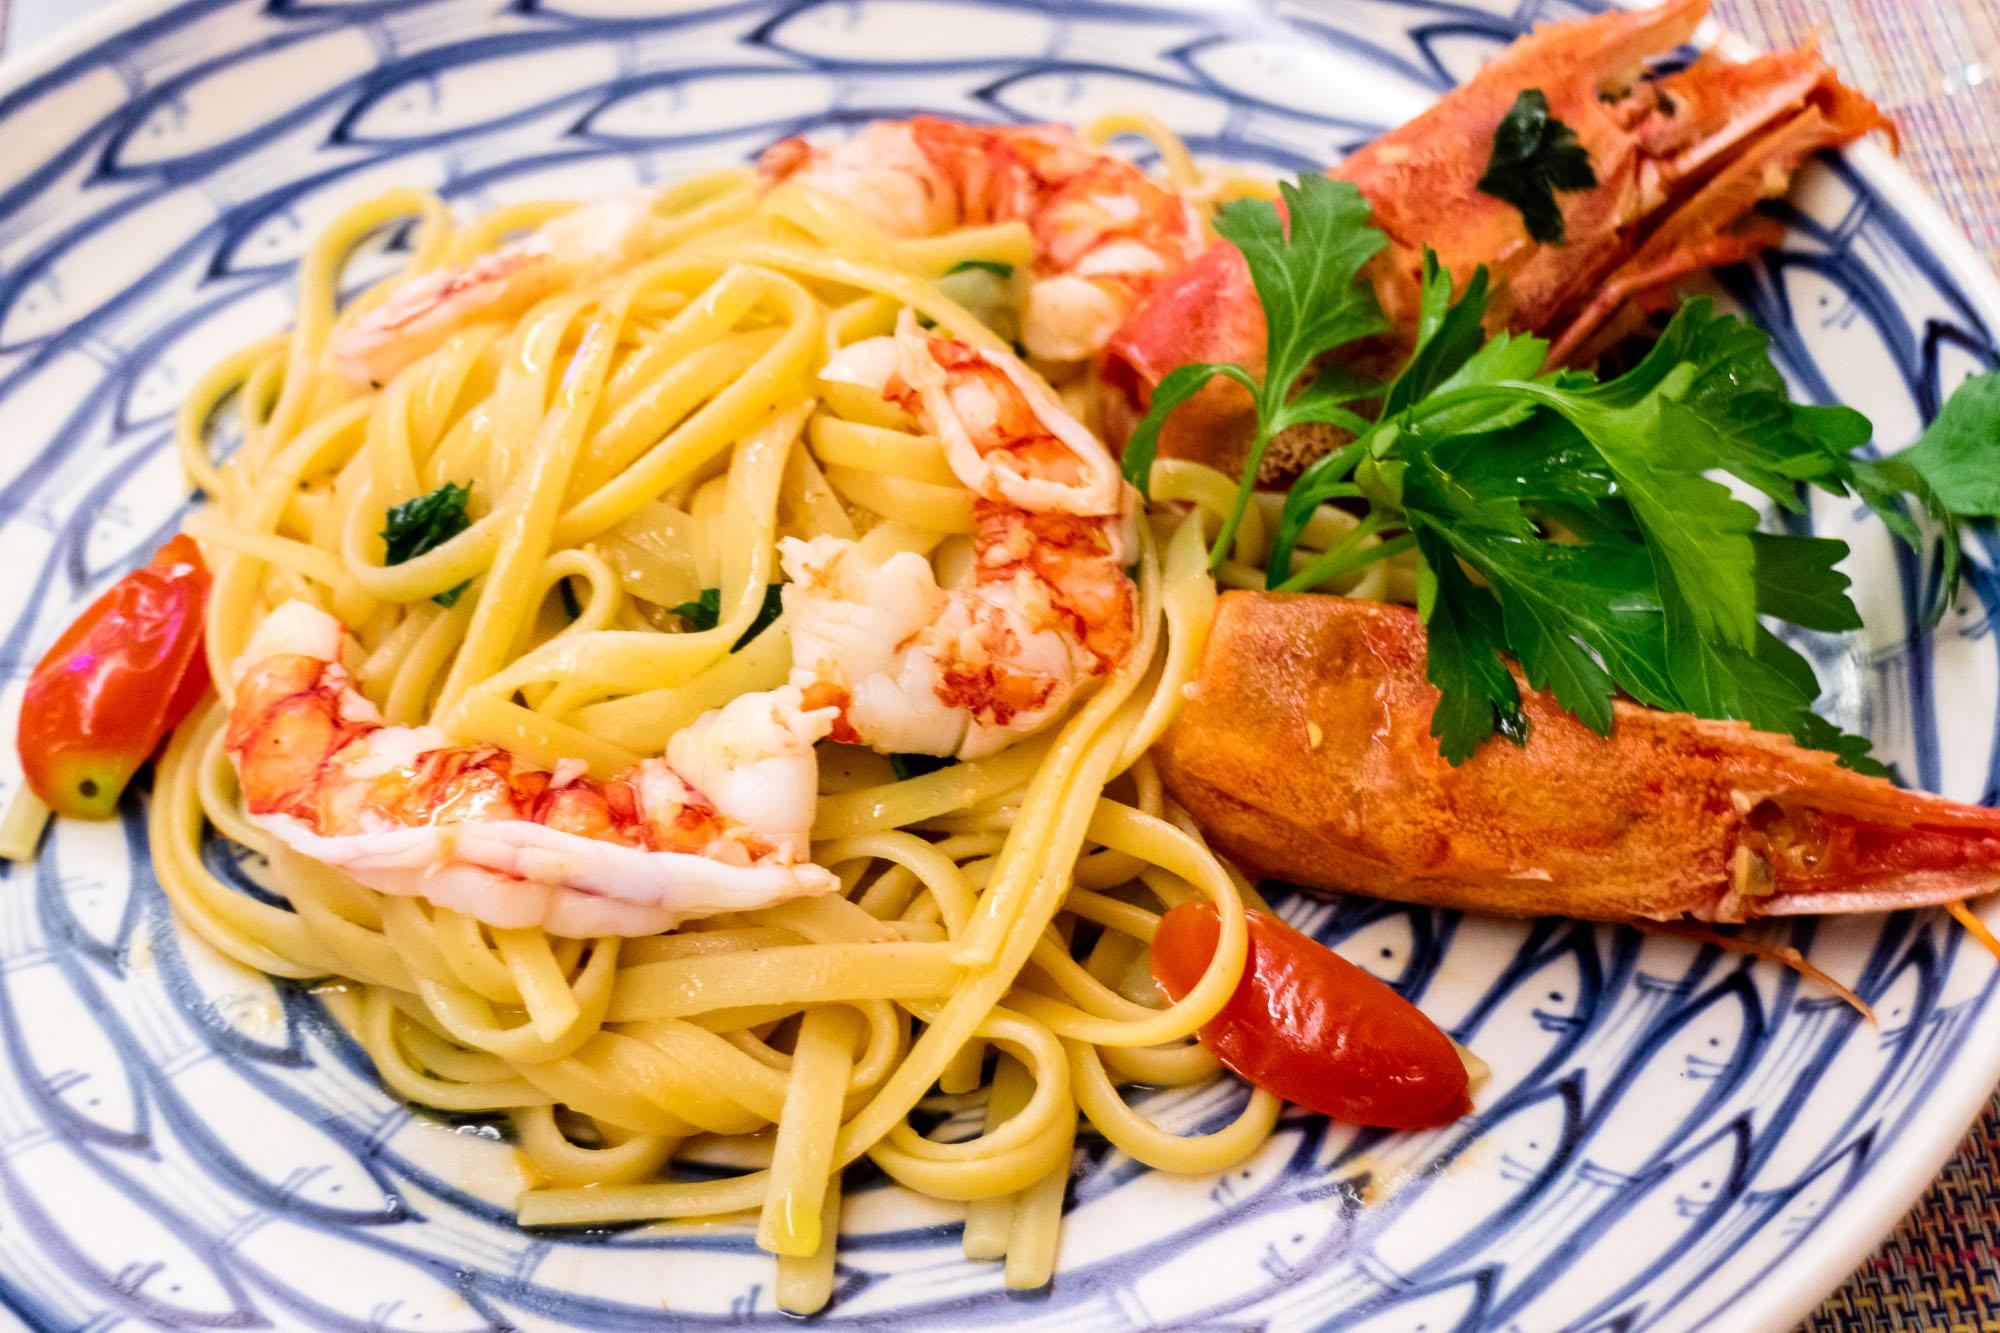 Gamberi Calderazzo on 31  Calderazzo on 31 ร้านอาหารอิตาเลี่ยนแท้ ย่านสุขุมวิท ที่แนะนำให้มาลอง p79b714jw4yBB3fqIkd o